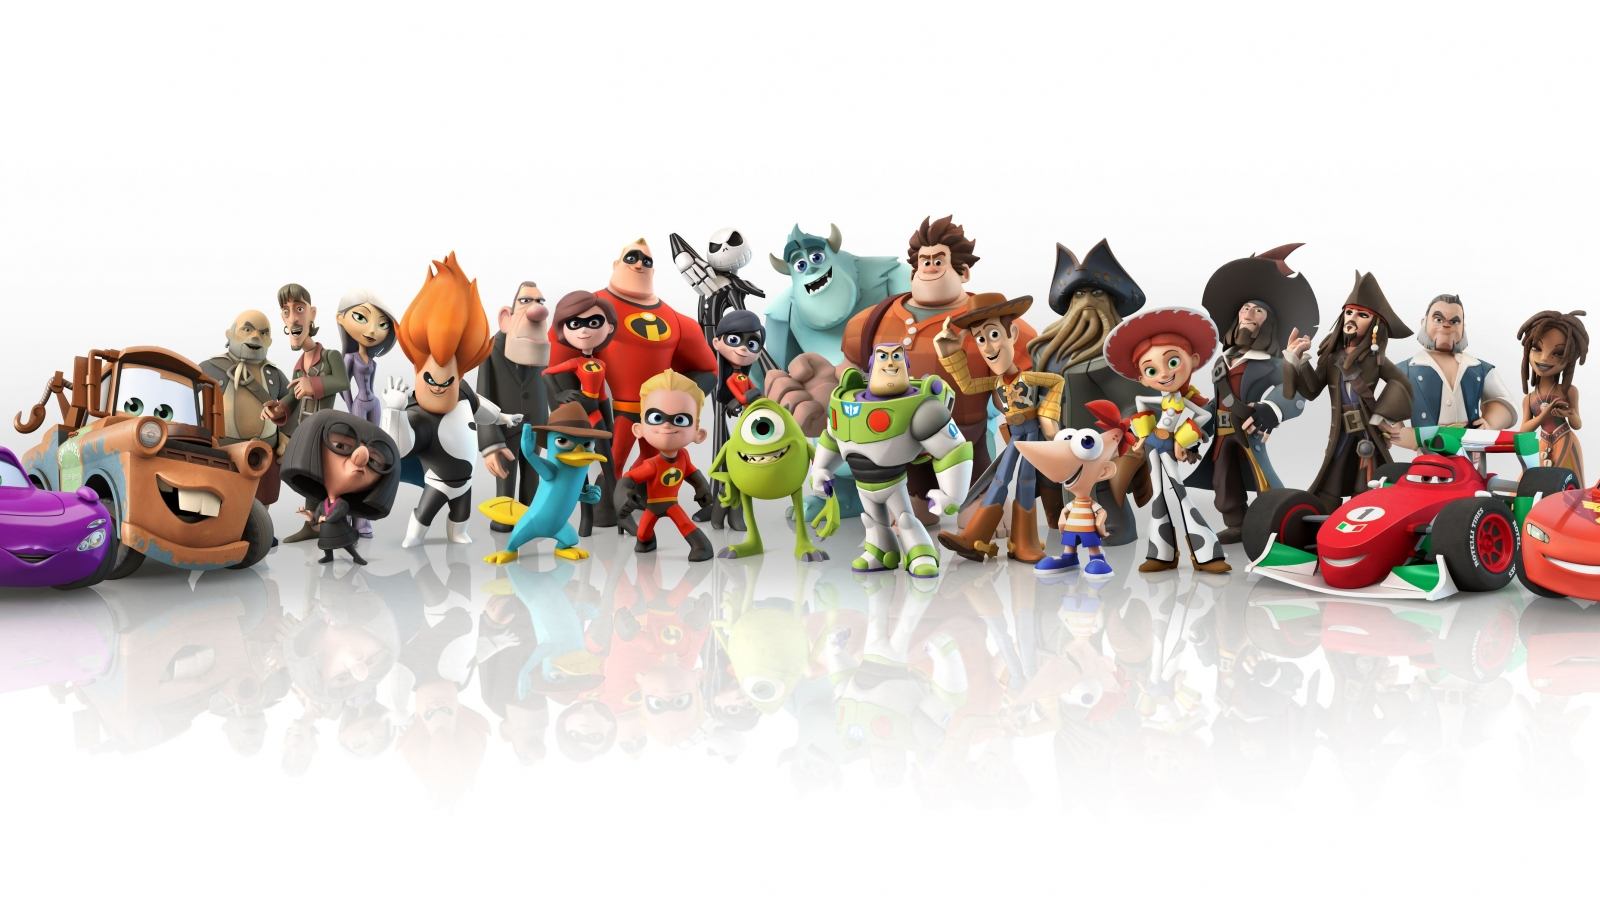 download Disney Pixar Compilation Images HD Wallpaper 1600x900